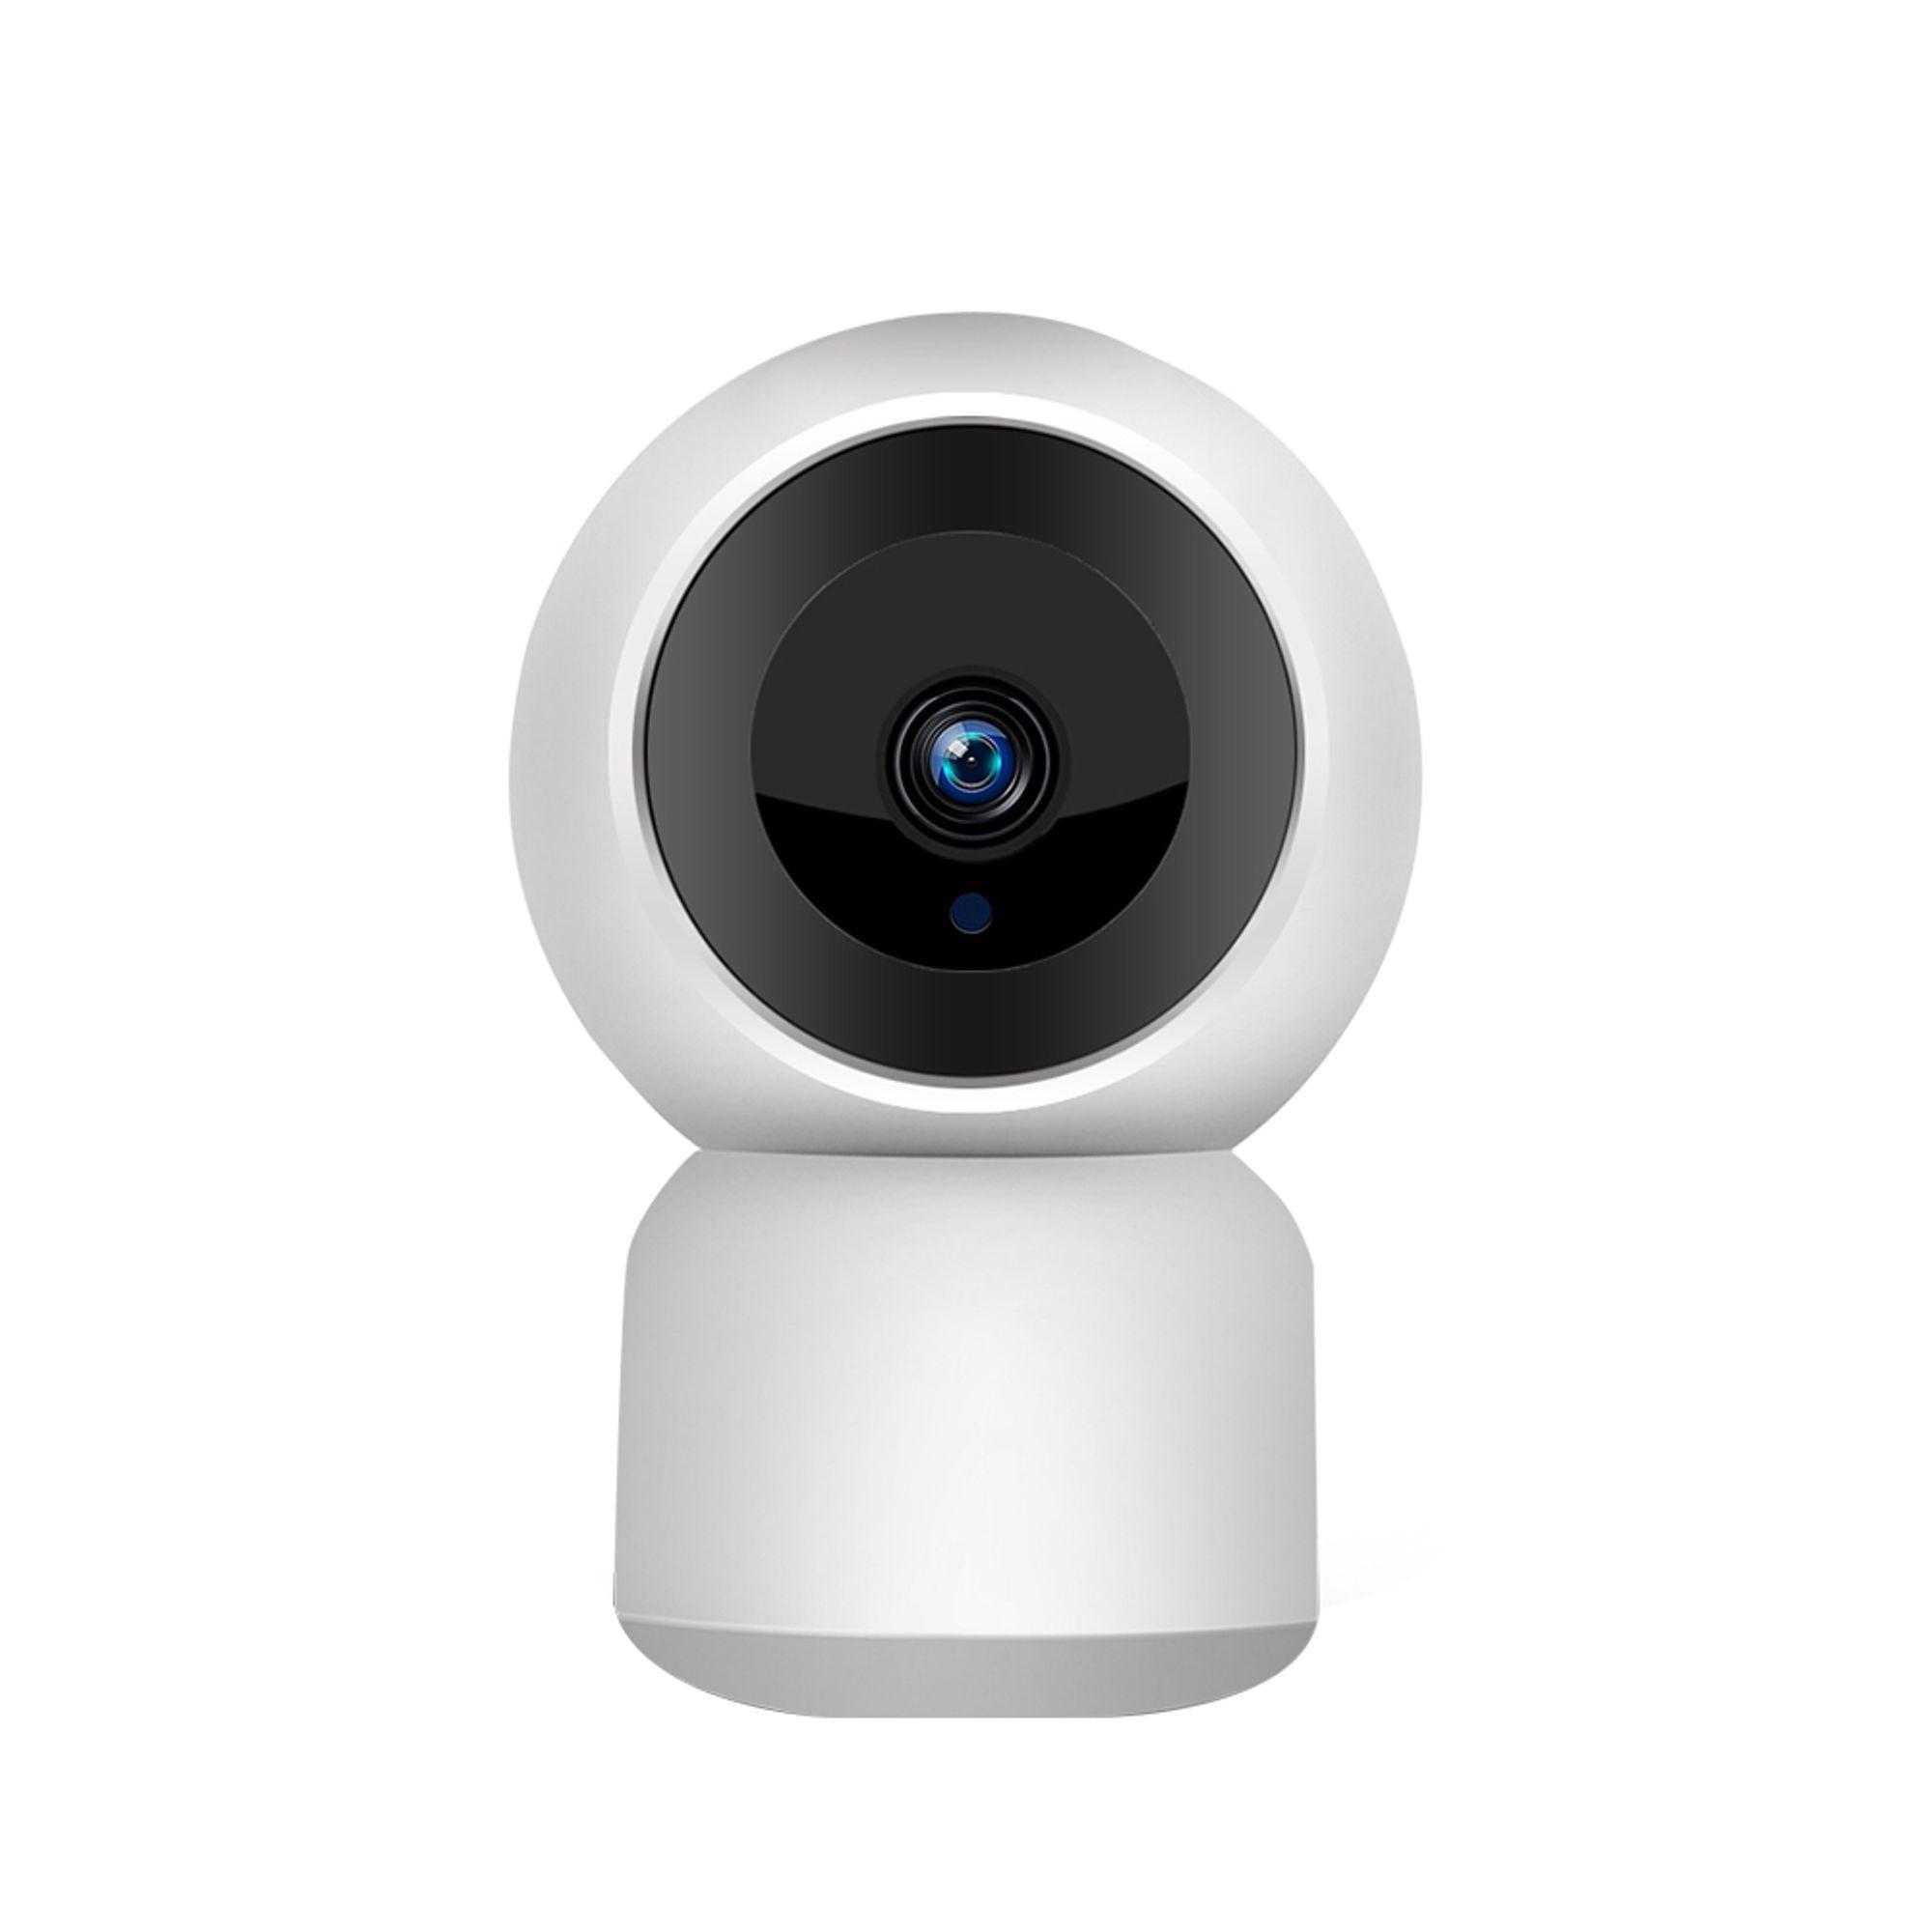 Camera de supraveghere IP BS-IP33L, WIFI, 3.6mm, 2.0MP CMOS, 1080P, Comunicare bidirectionala, Night vision, Camera rotativa, Detectie miscare, Stocare in cloud, Alerte pe telefonul mobil/ Email